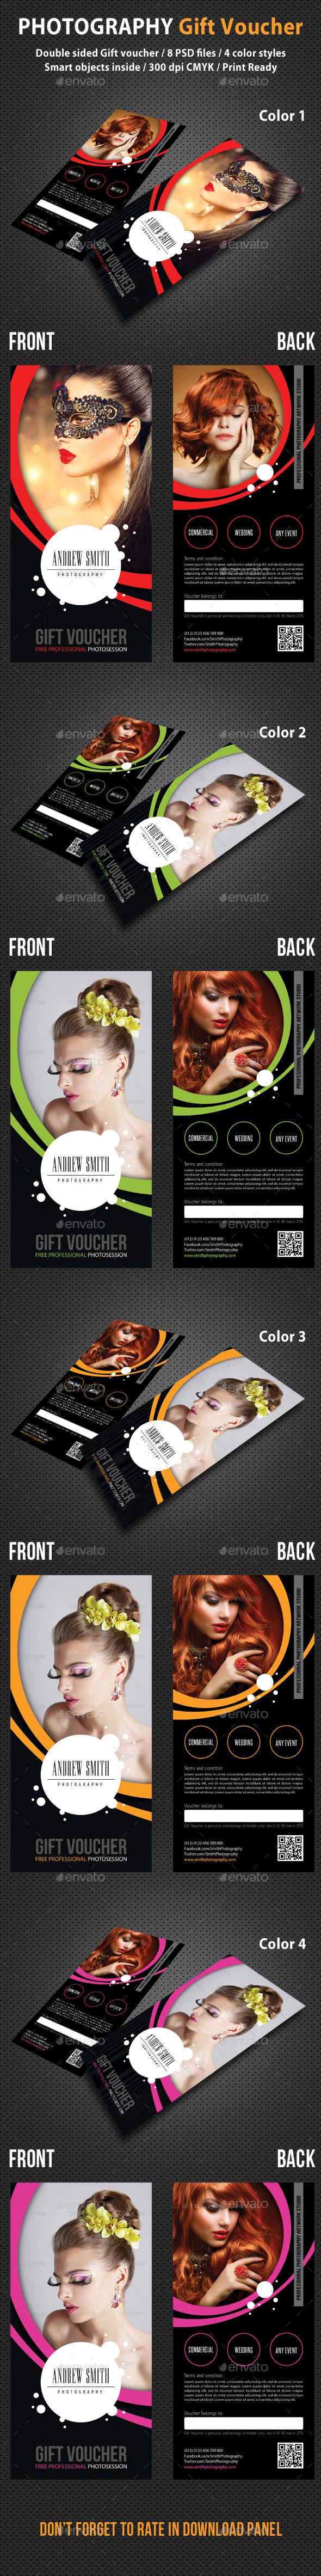 GraphicRiver Photography Studio Gift Voucher 04 10467953